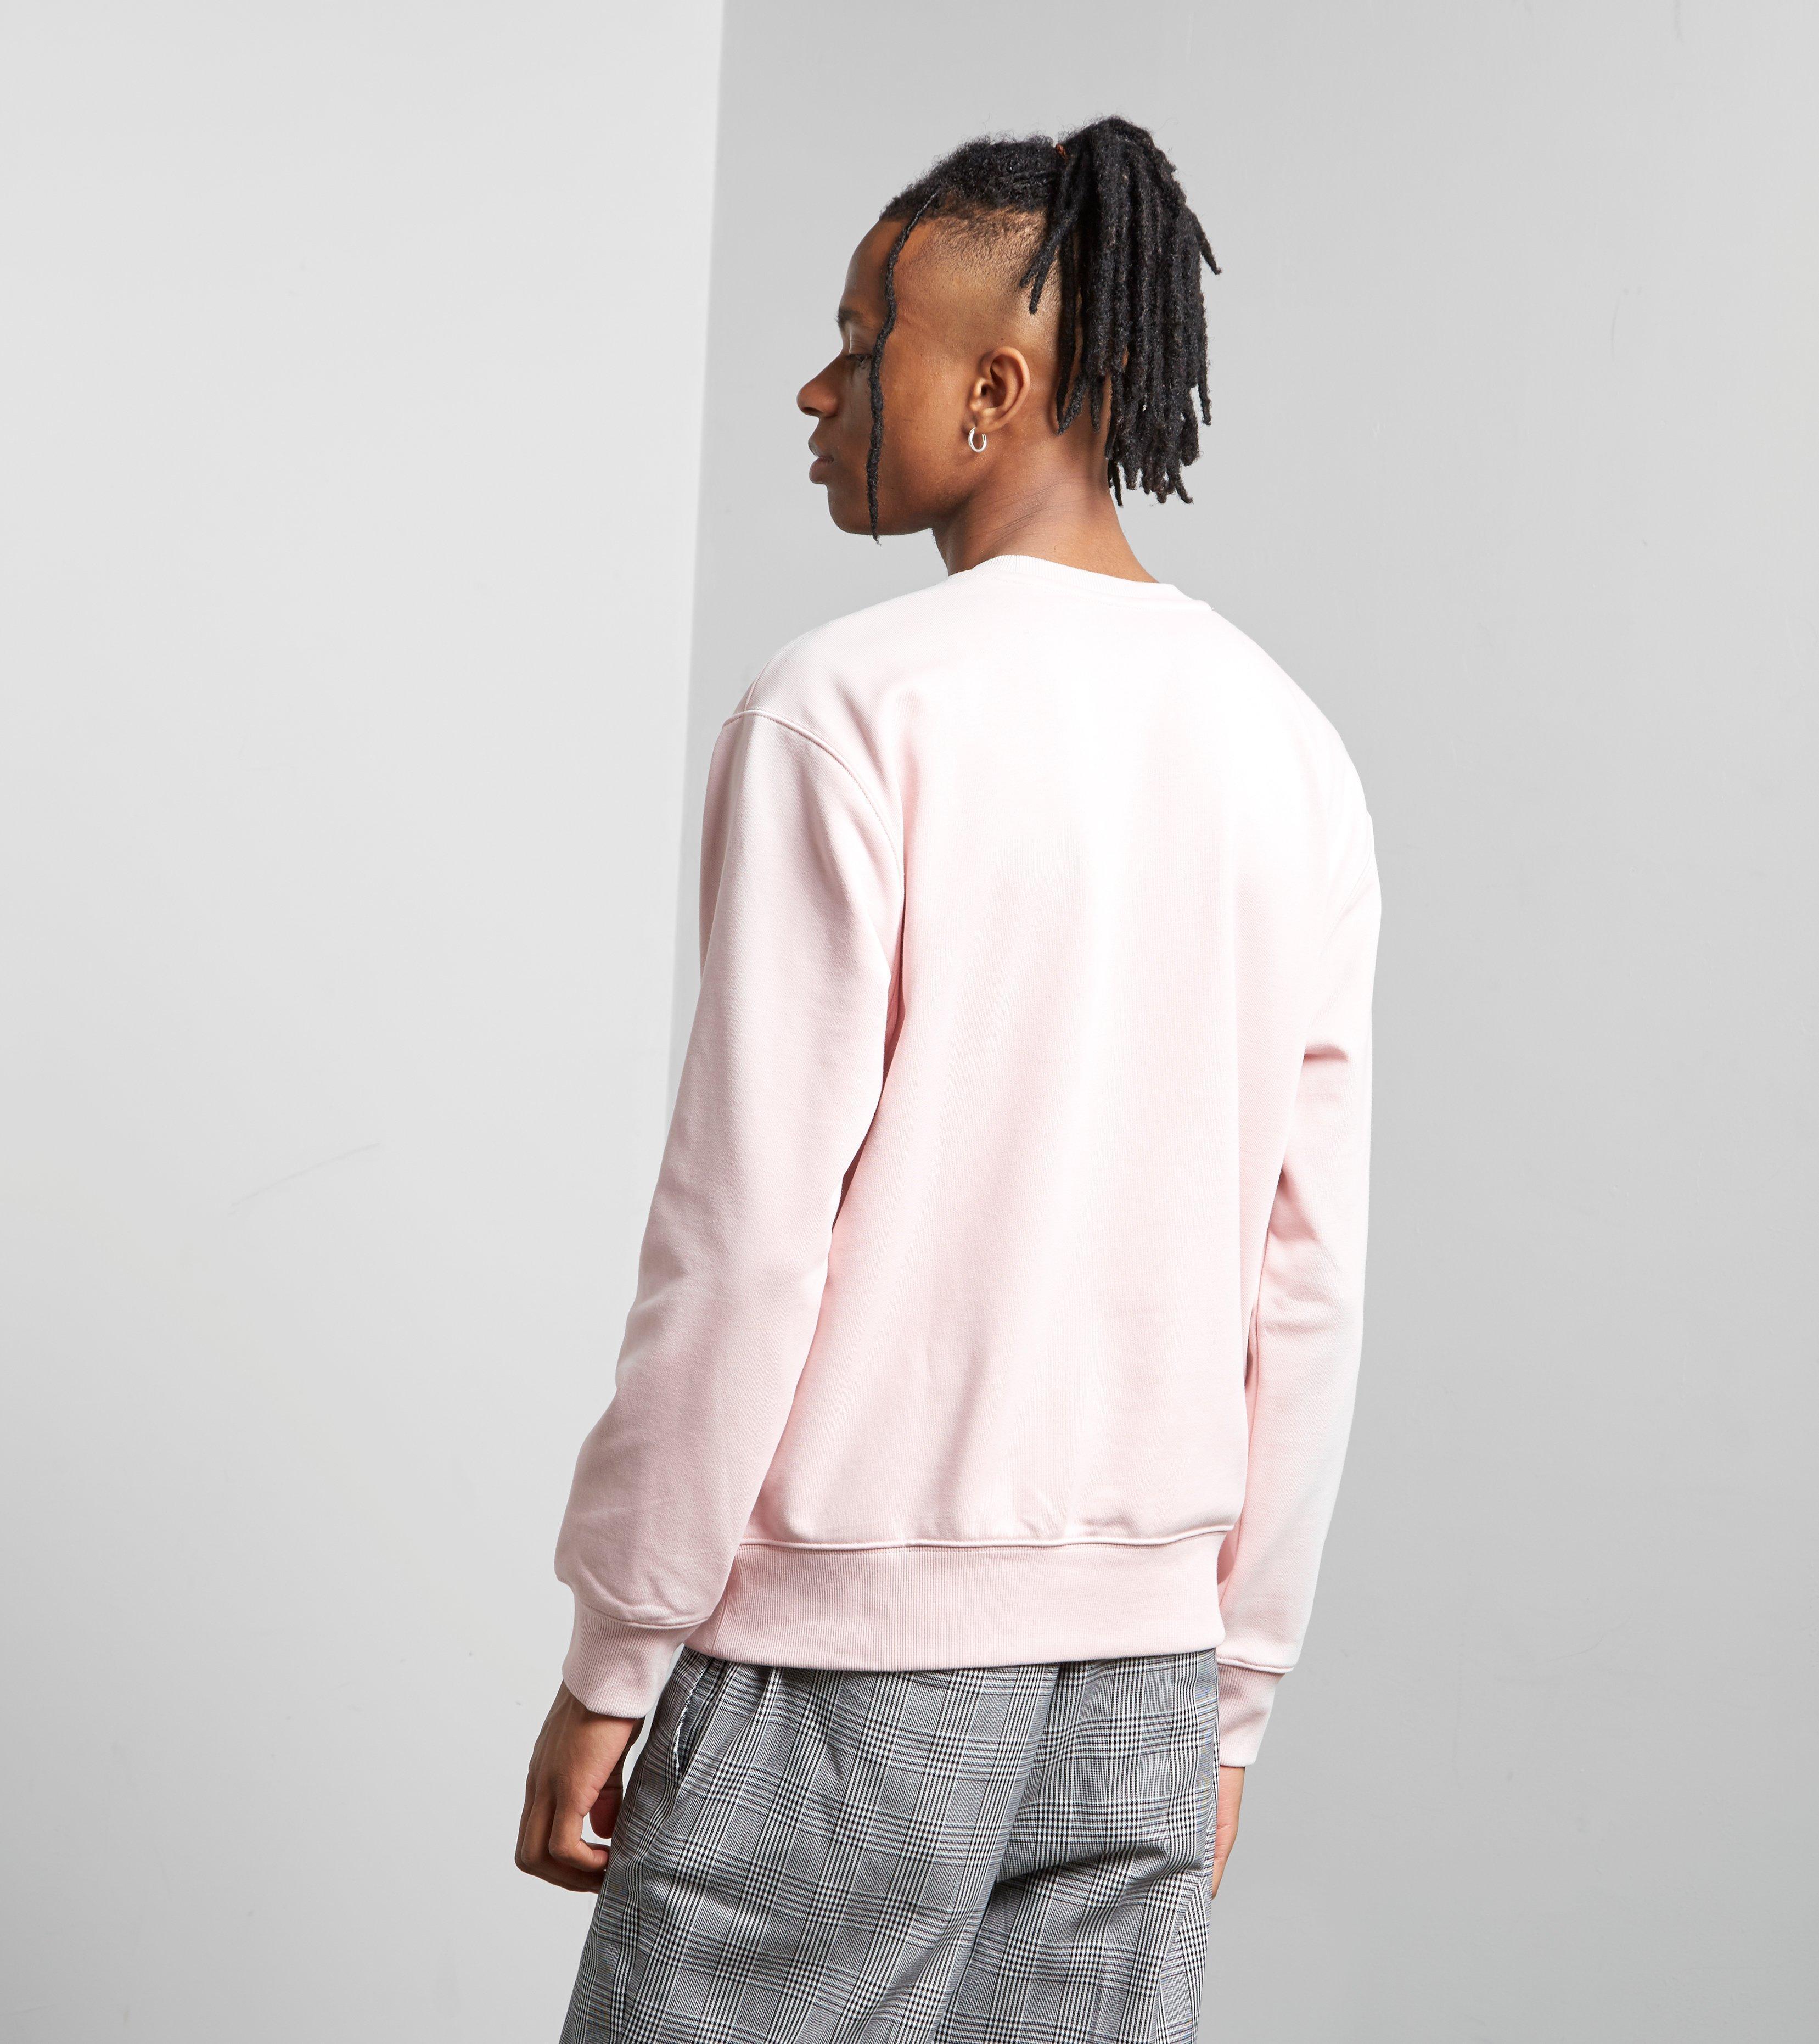 Carhartt WIP - Pink Big Script Sweatshirt for Men - Lyst. View fullscreen 4e1ce64b52f2